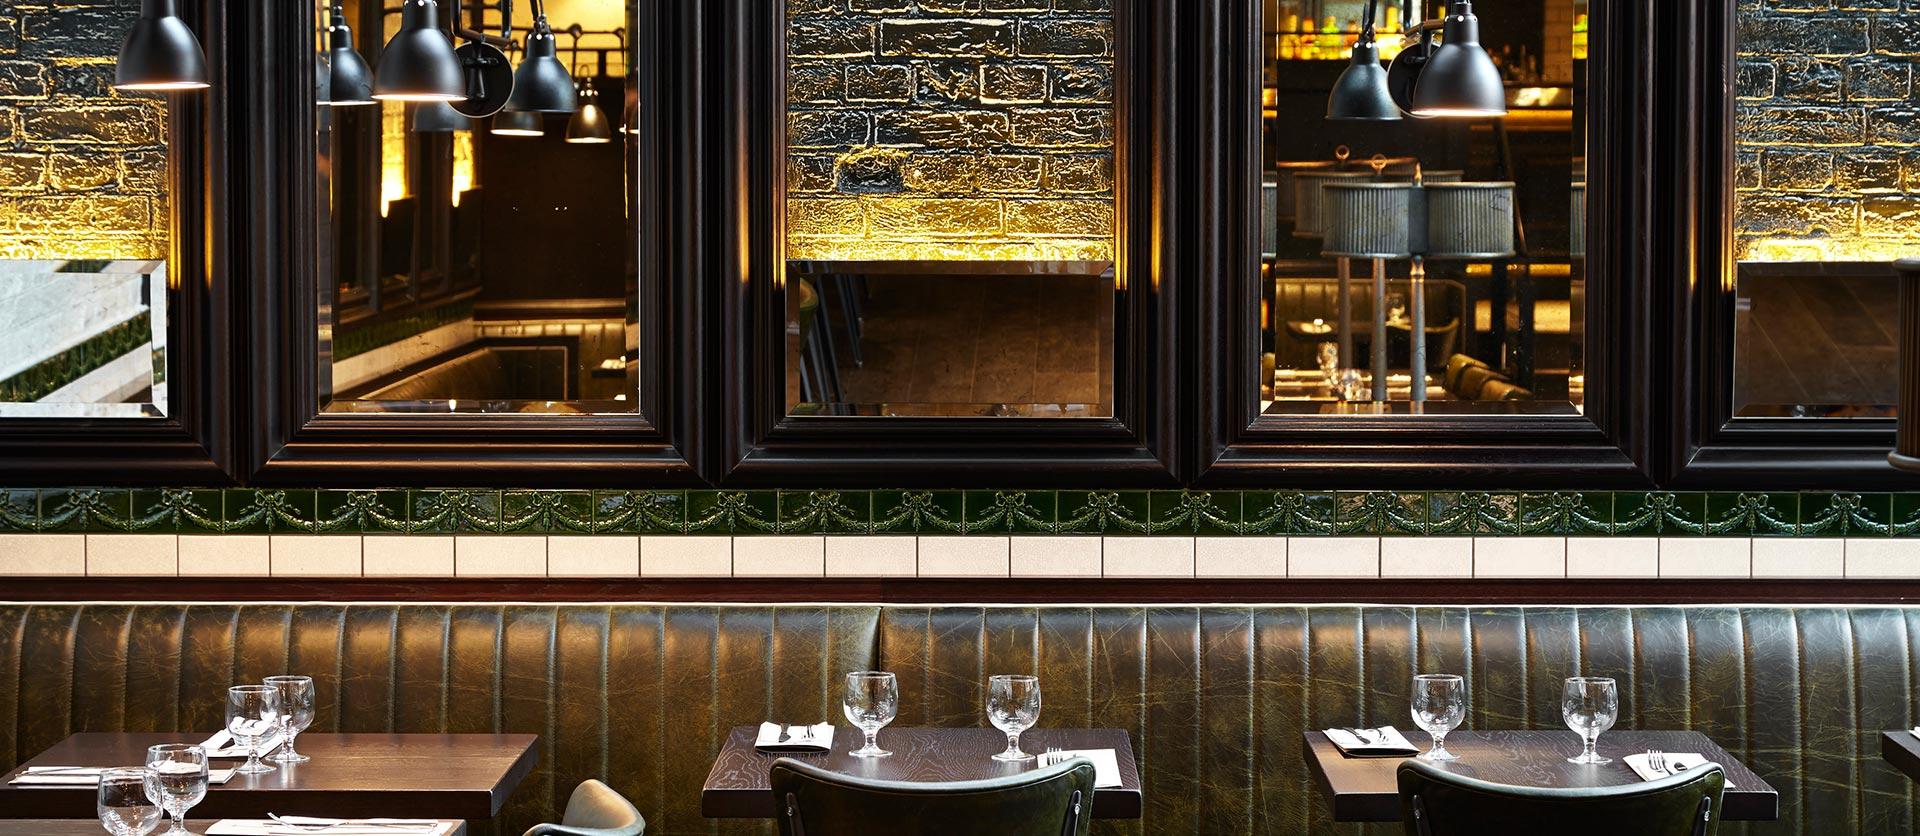 Restaurants near garrick theatre london